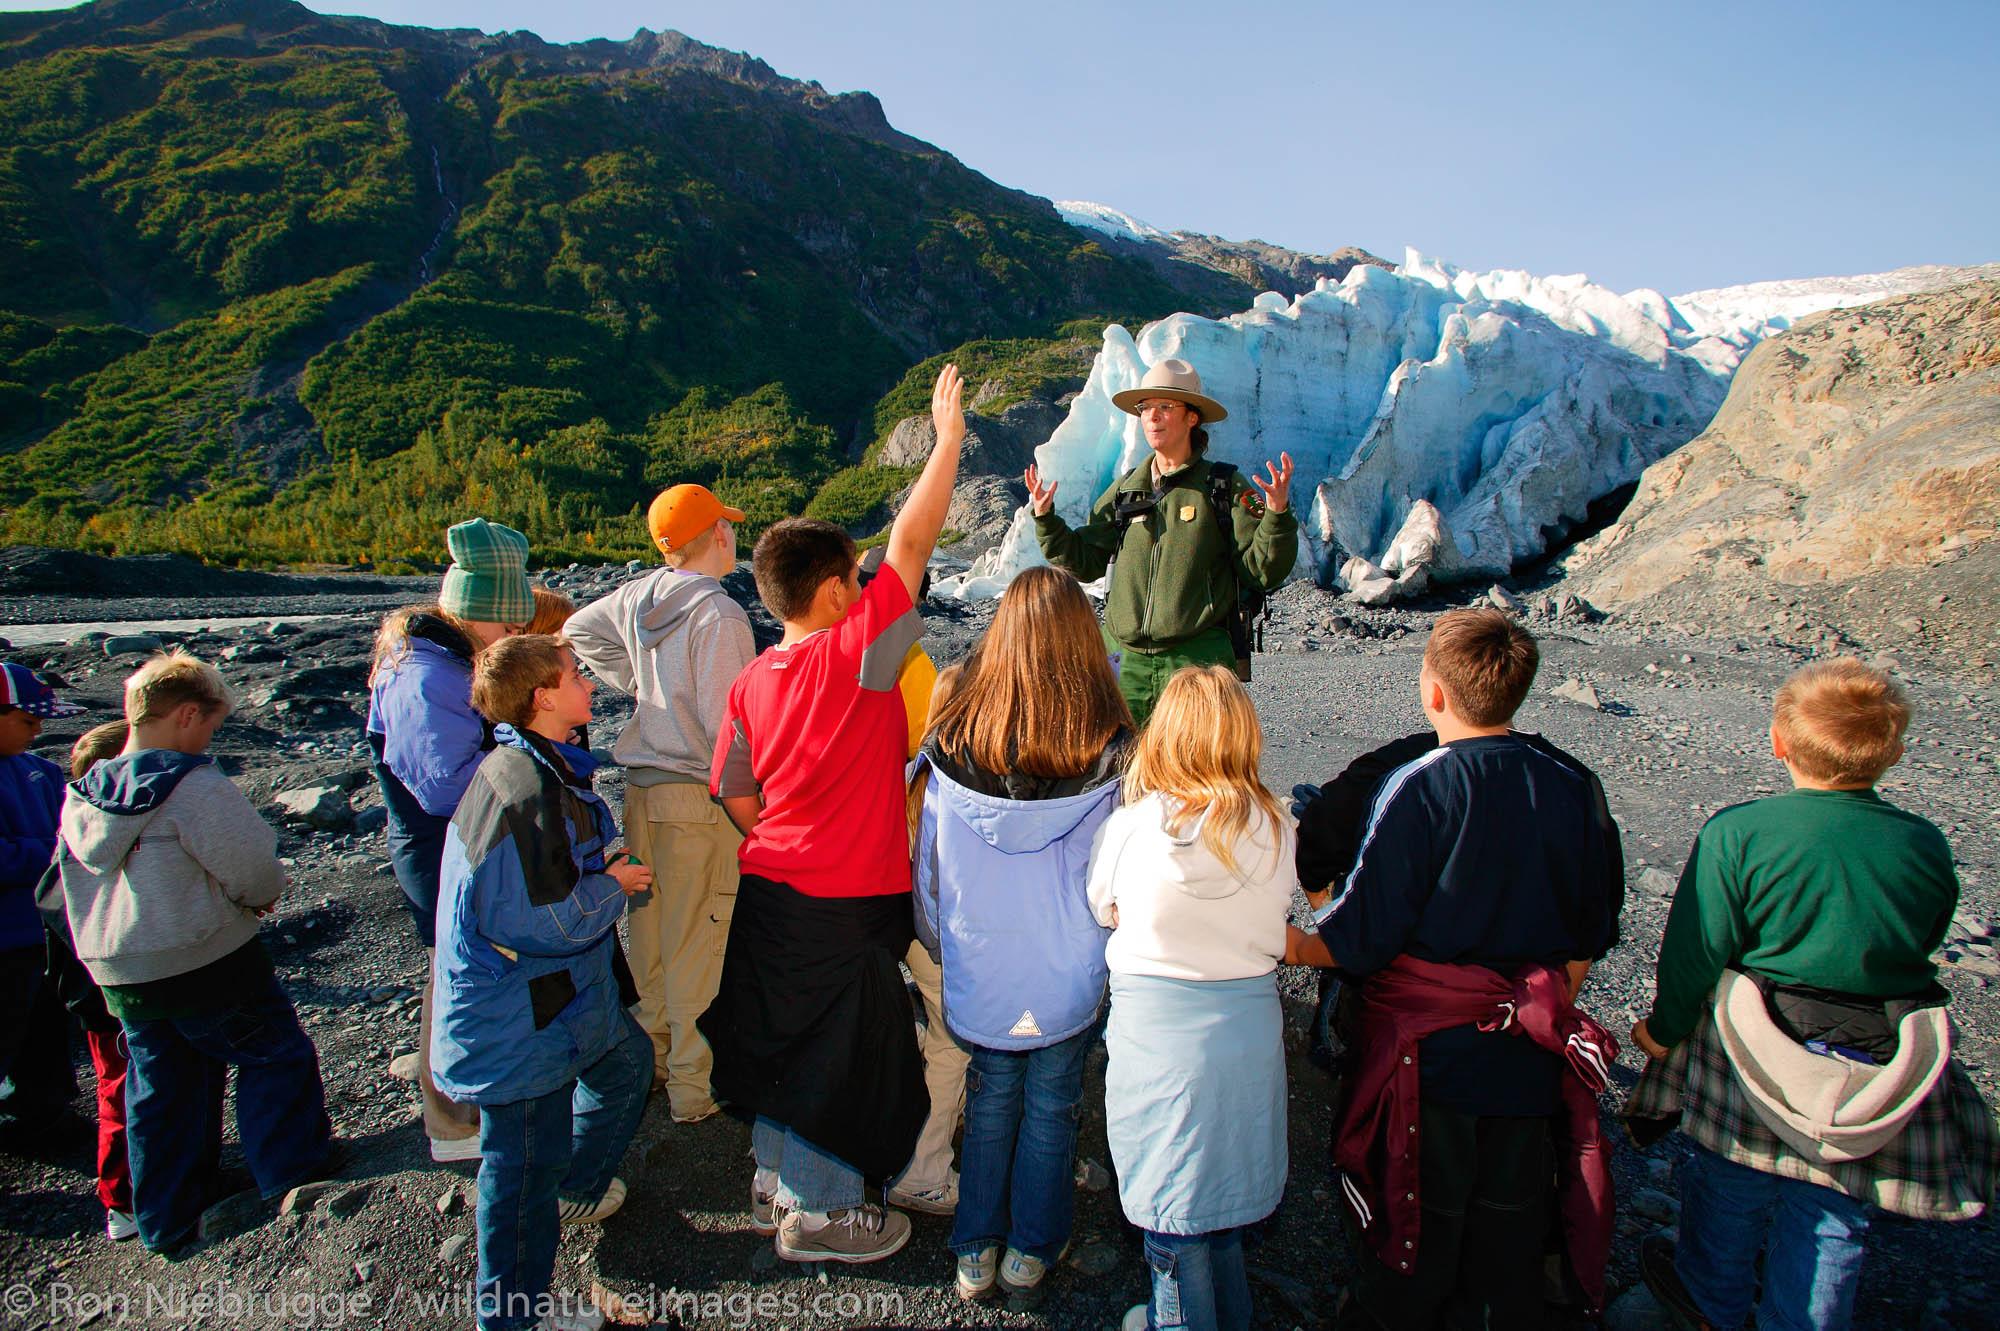 A Park Ranger leading a group of students on a field trip to Exit Glacier, Kenai Fjords National Park, near Seward, Alaska.